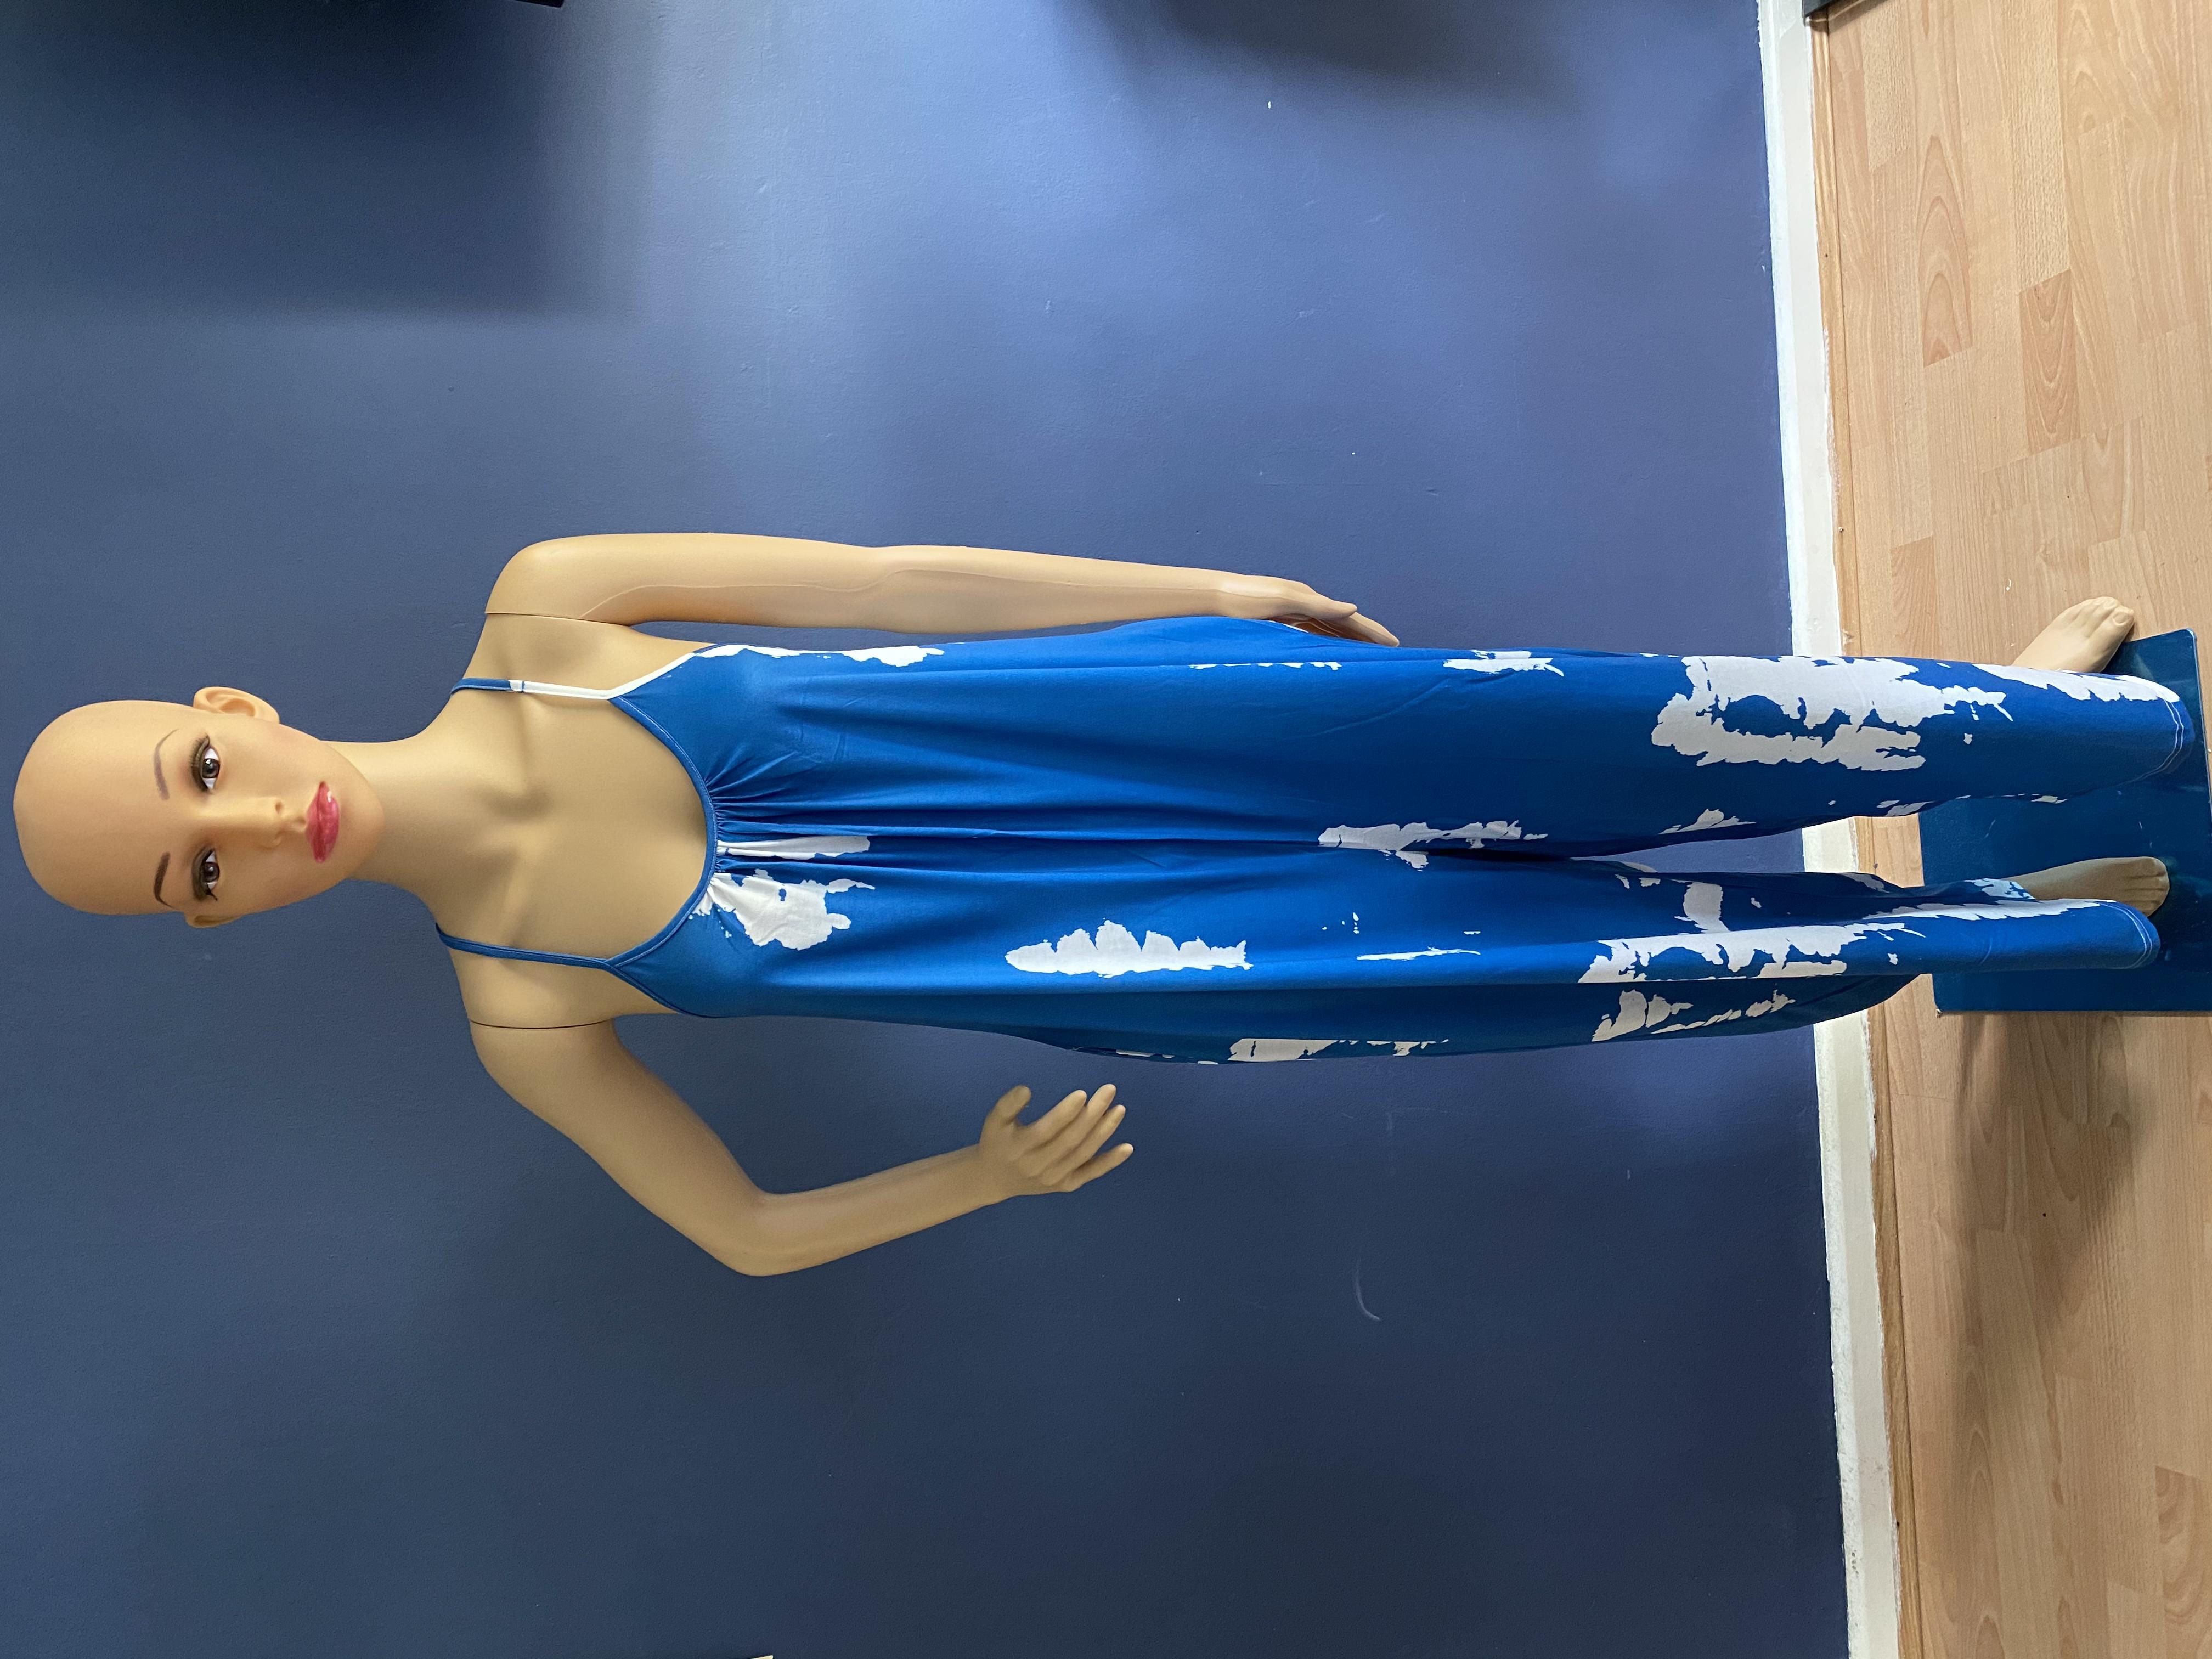 Blue tie dye strap jumpsuit sizes medium large and extra large